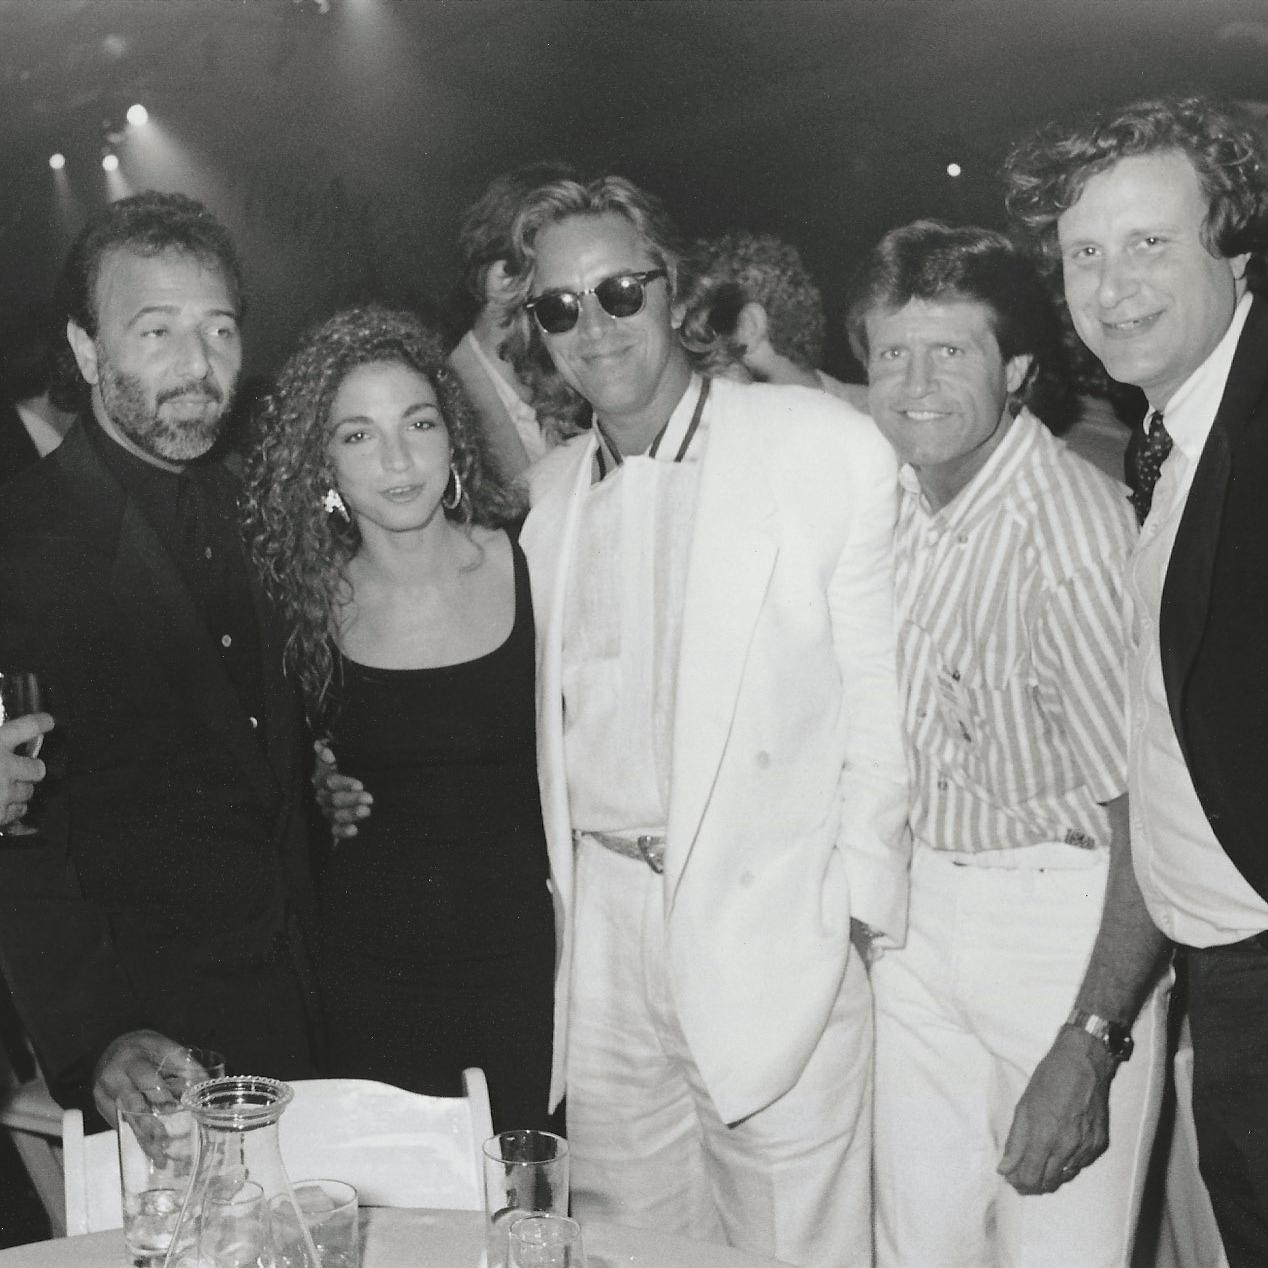 Gloria Estefan & Don Johnson